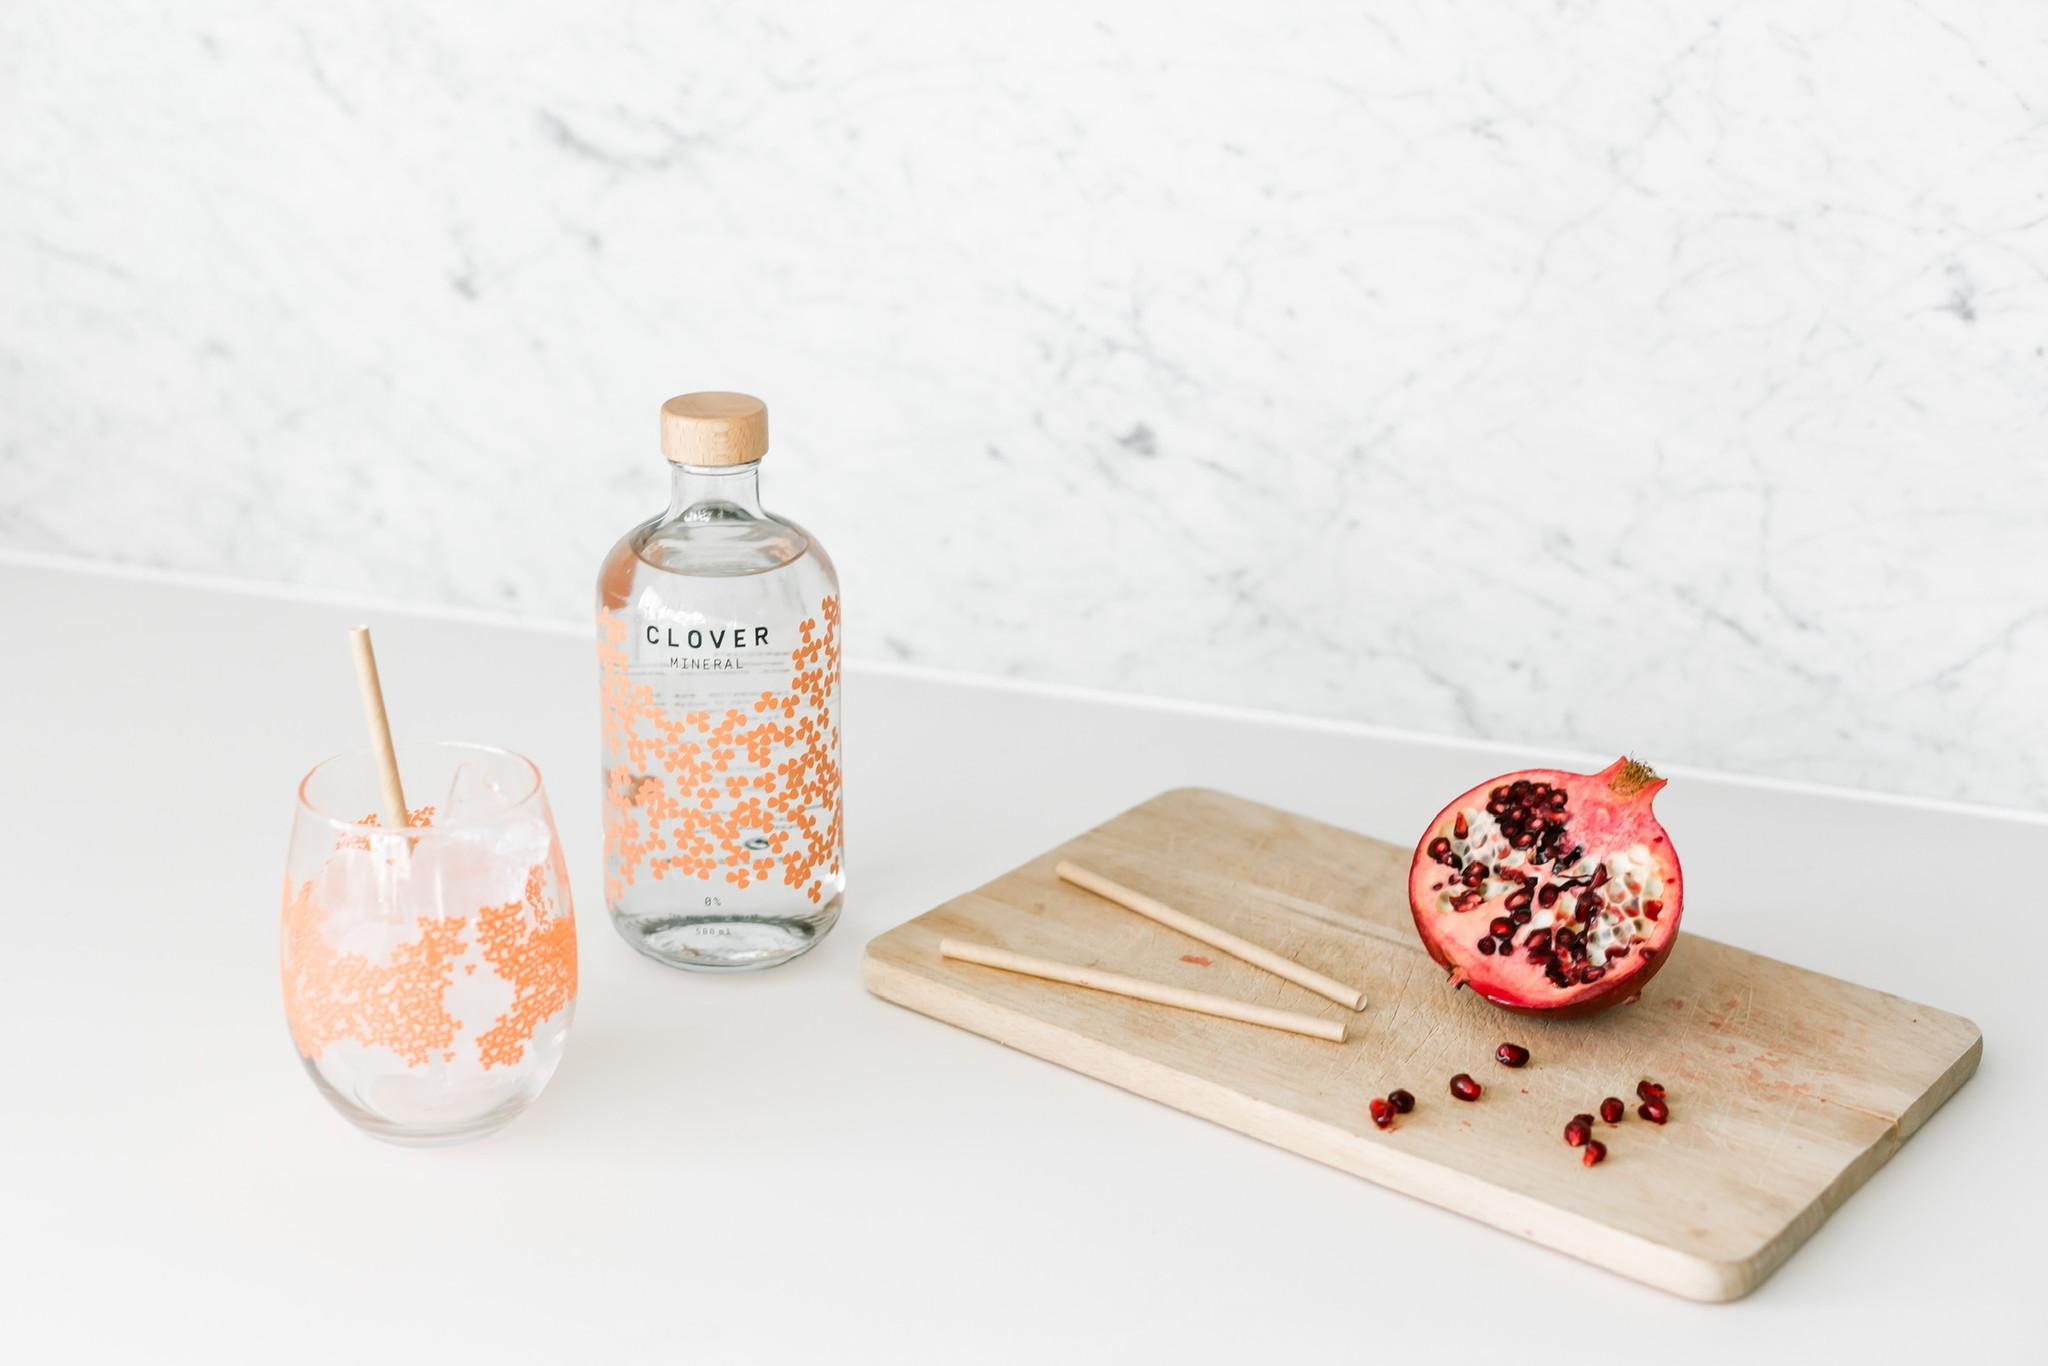 Clover gin online bestellen